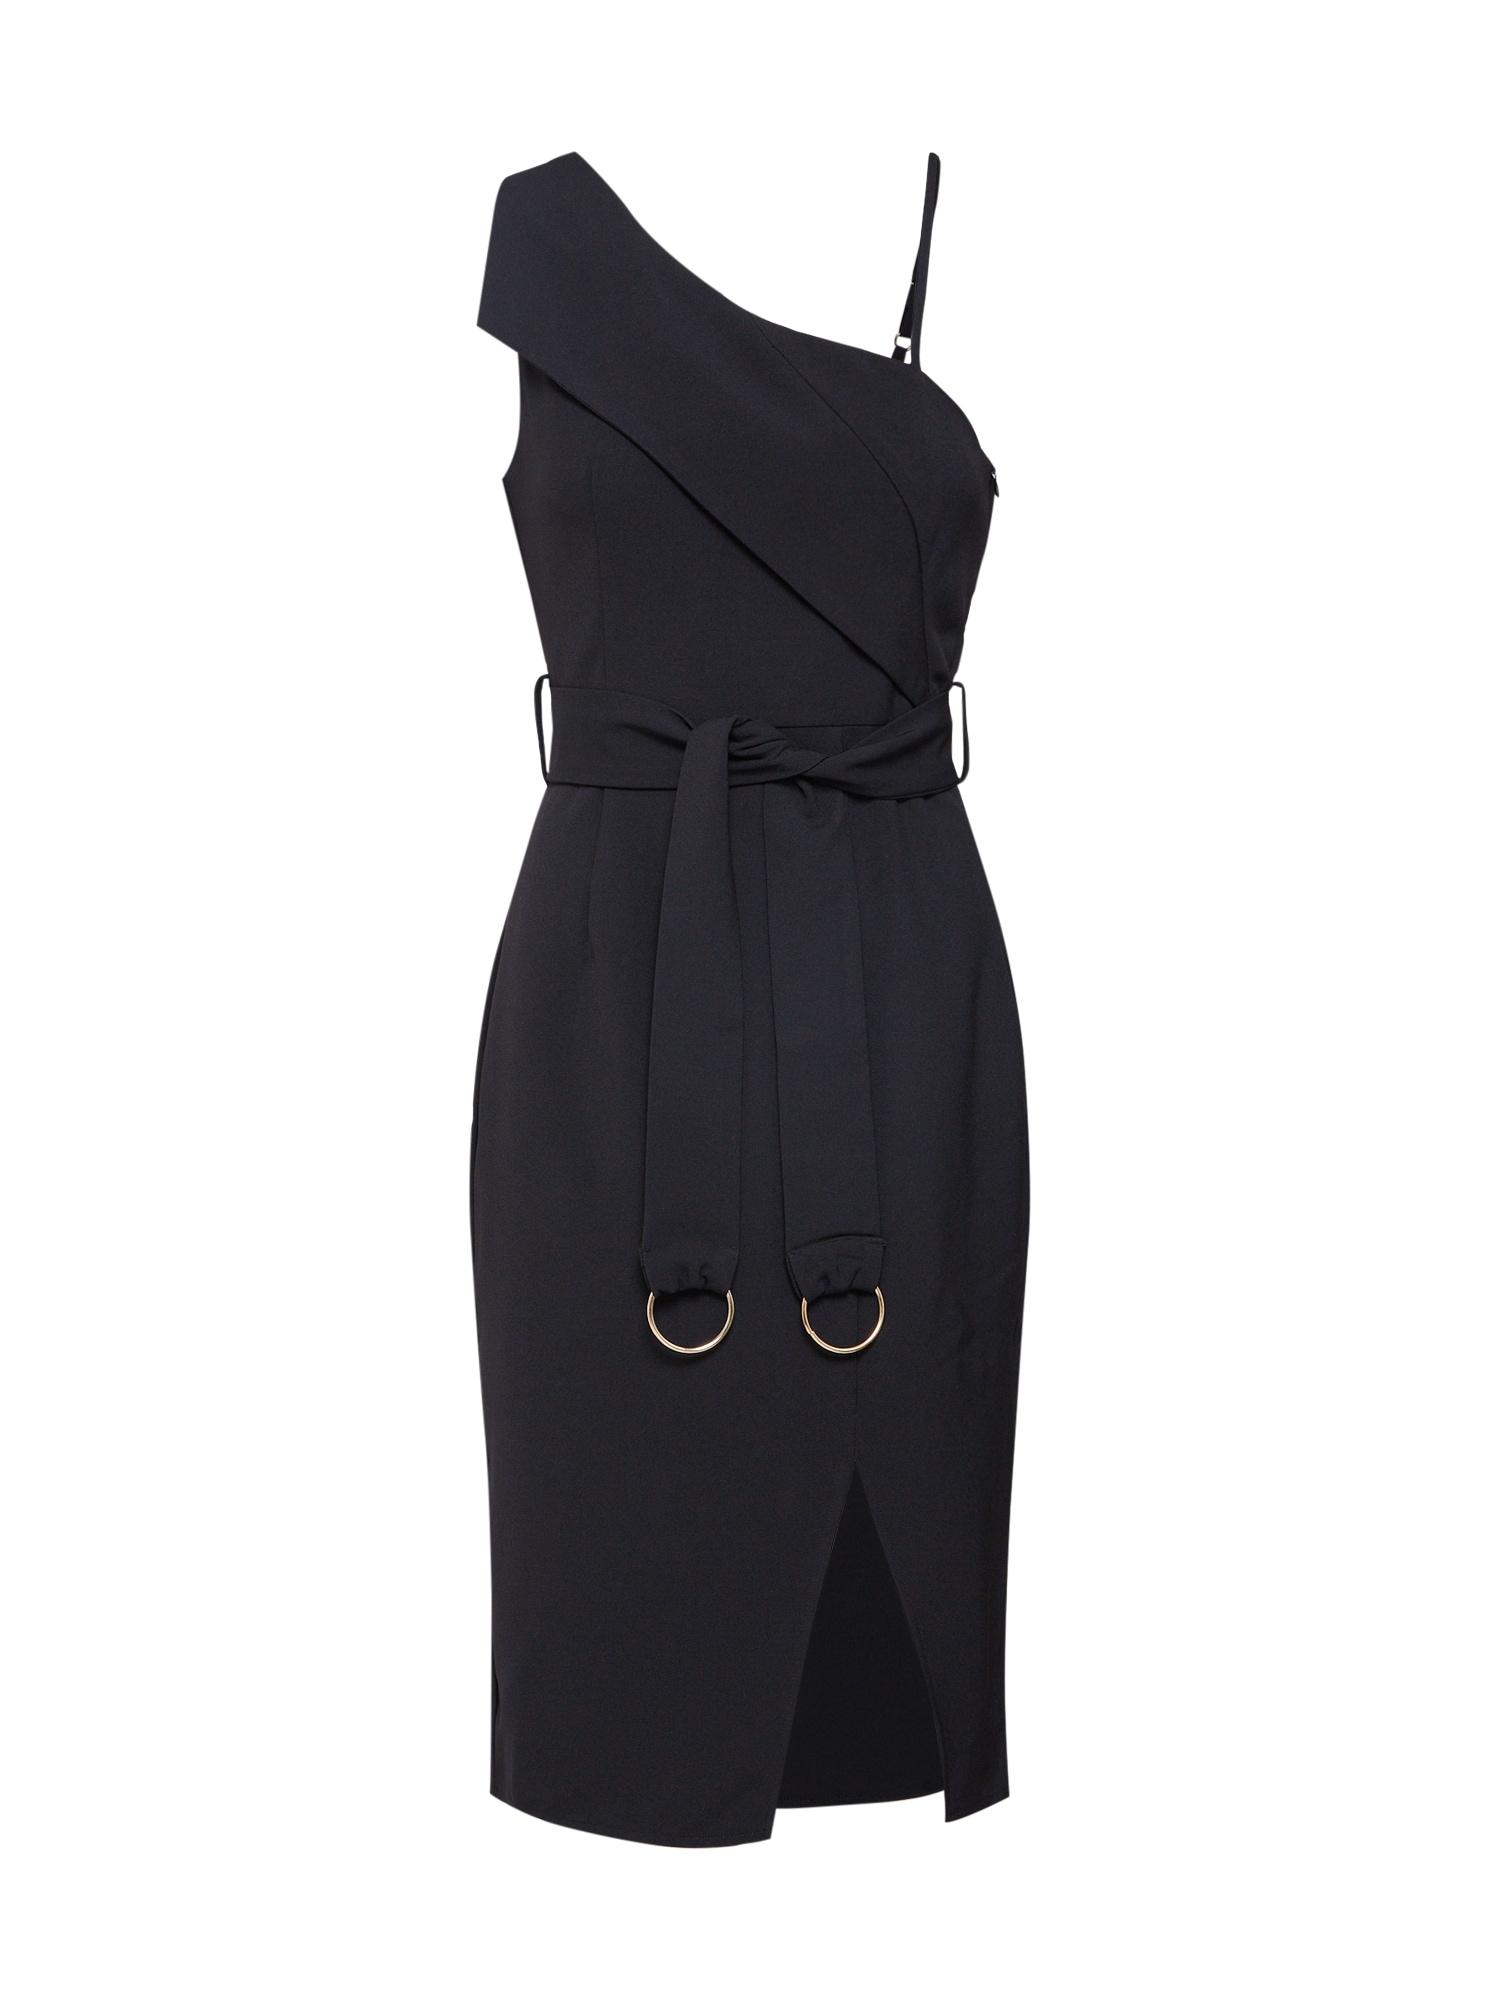 Šaty HUNTER černá 4th & Reckless